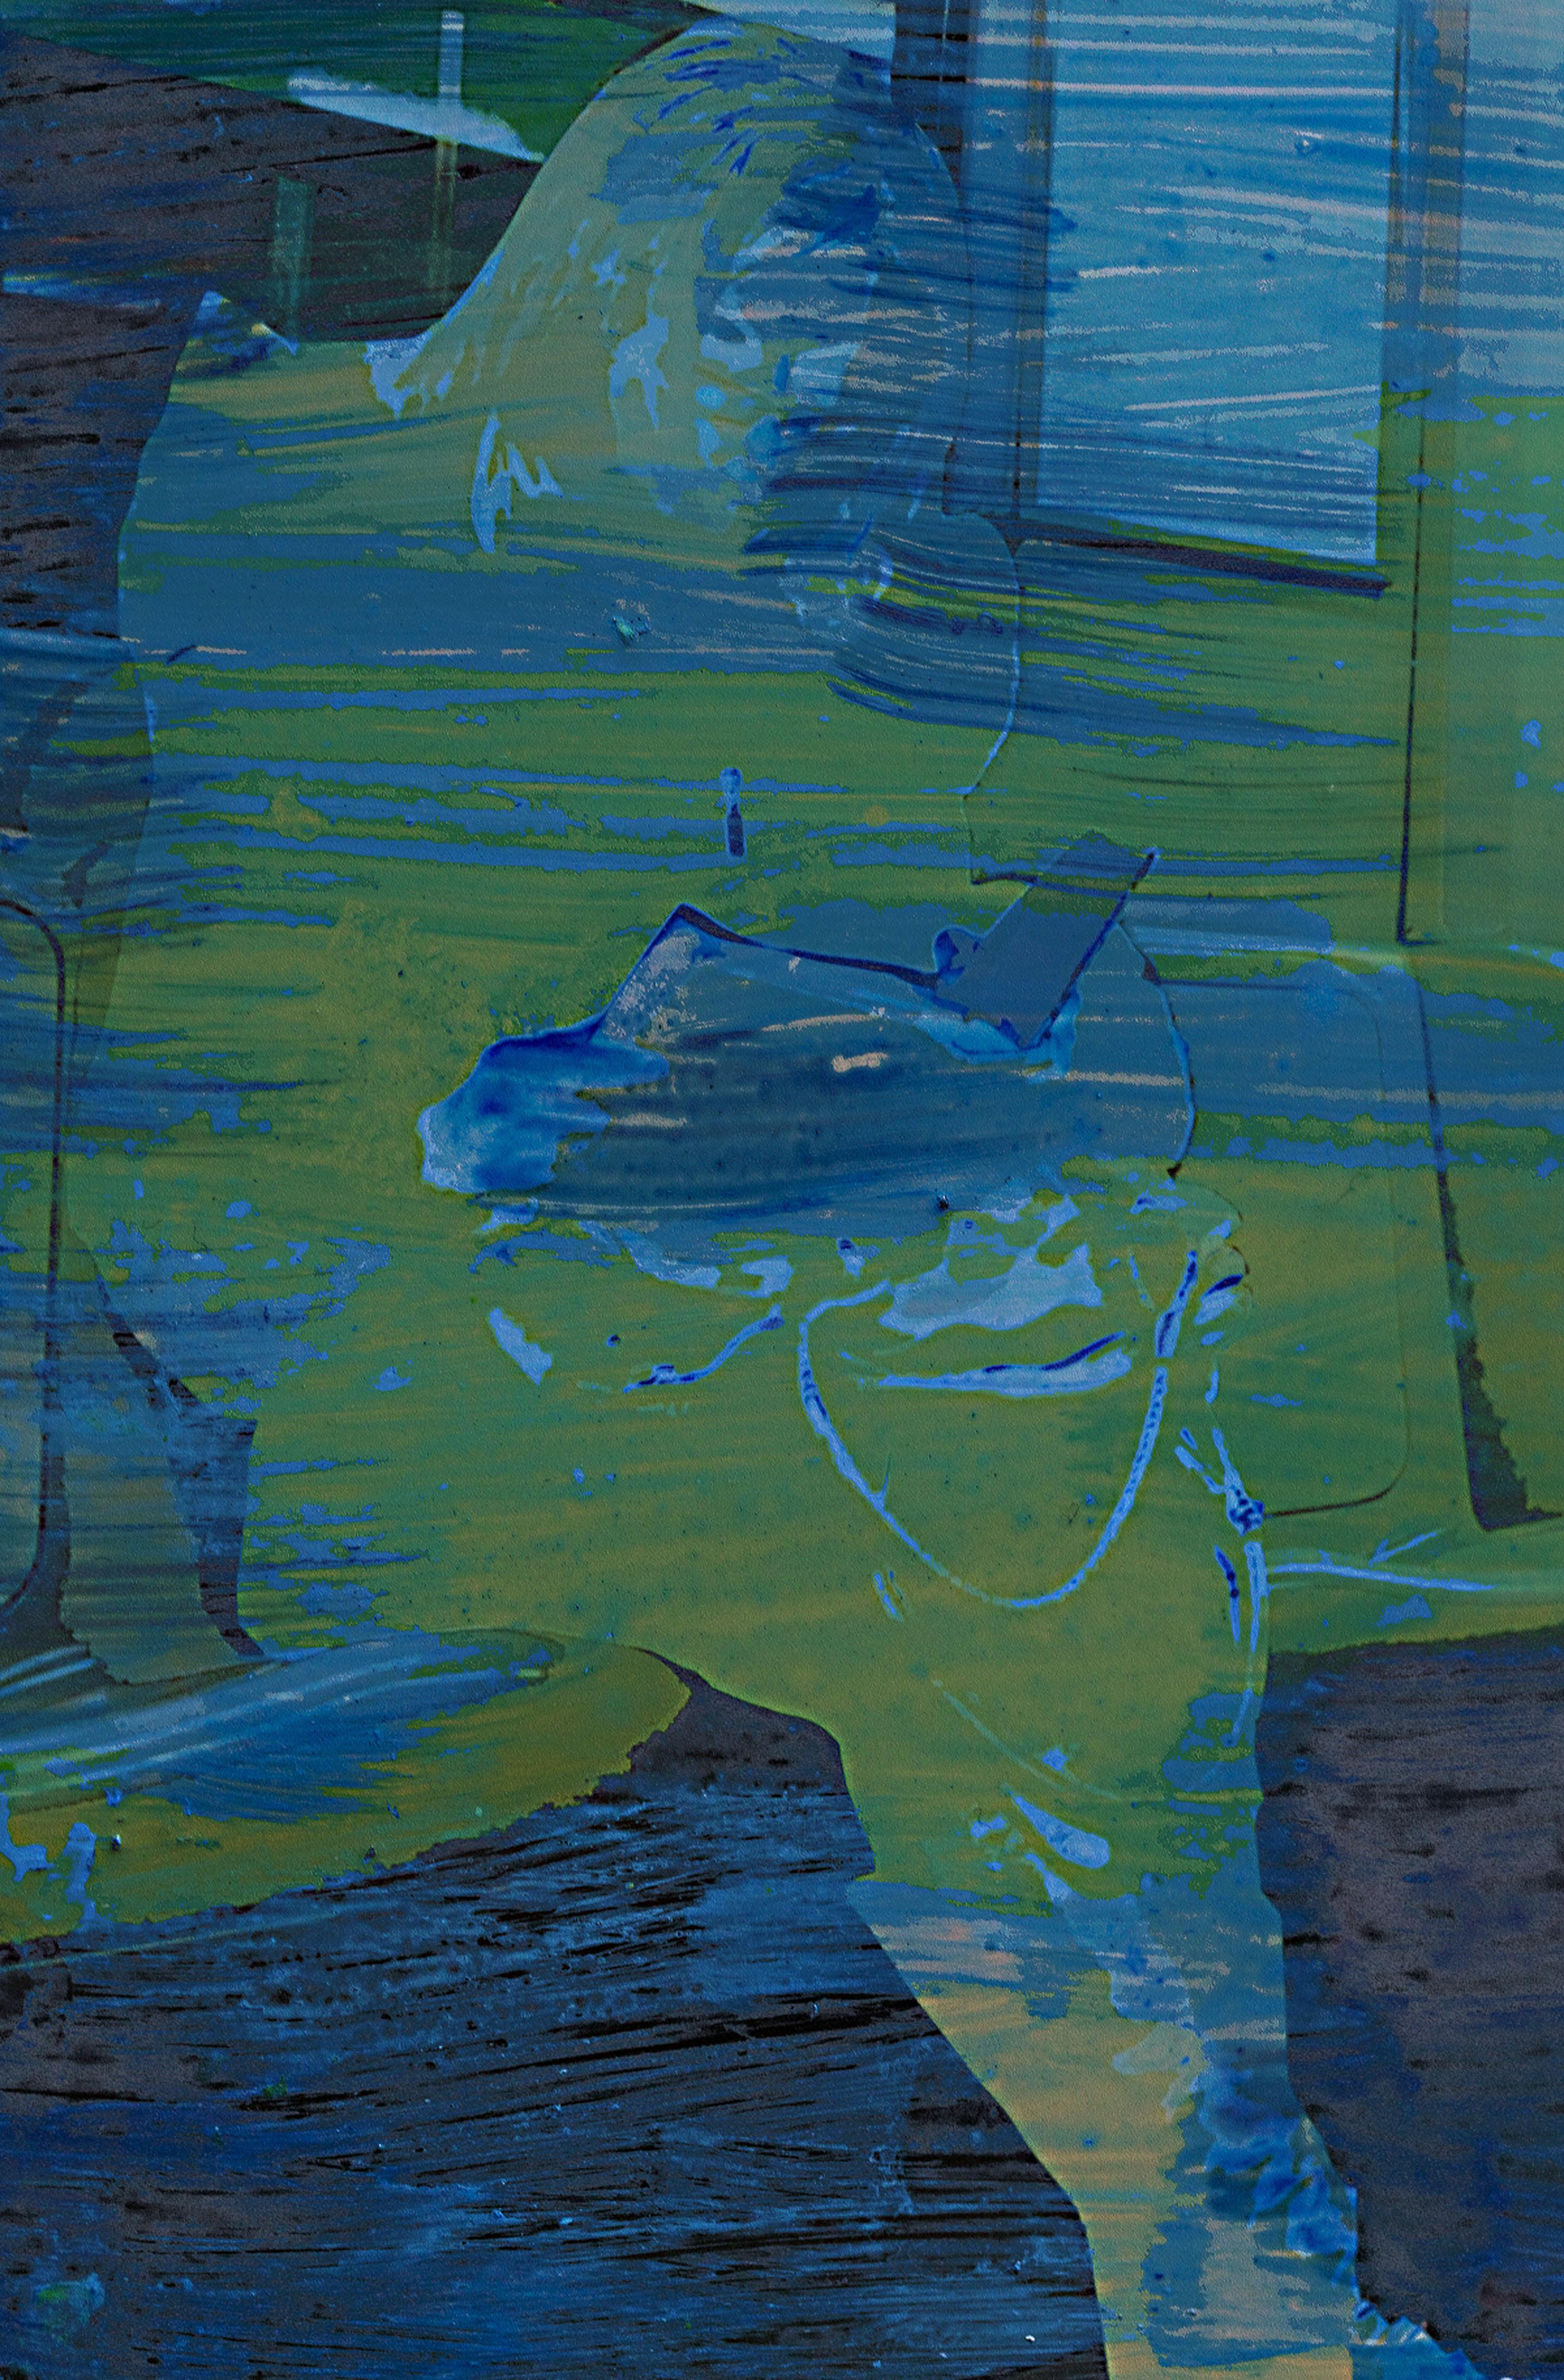 Passeggero seduto blu Milano Artista Massimo motta Italy